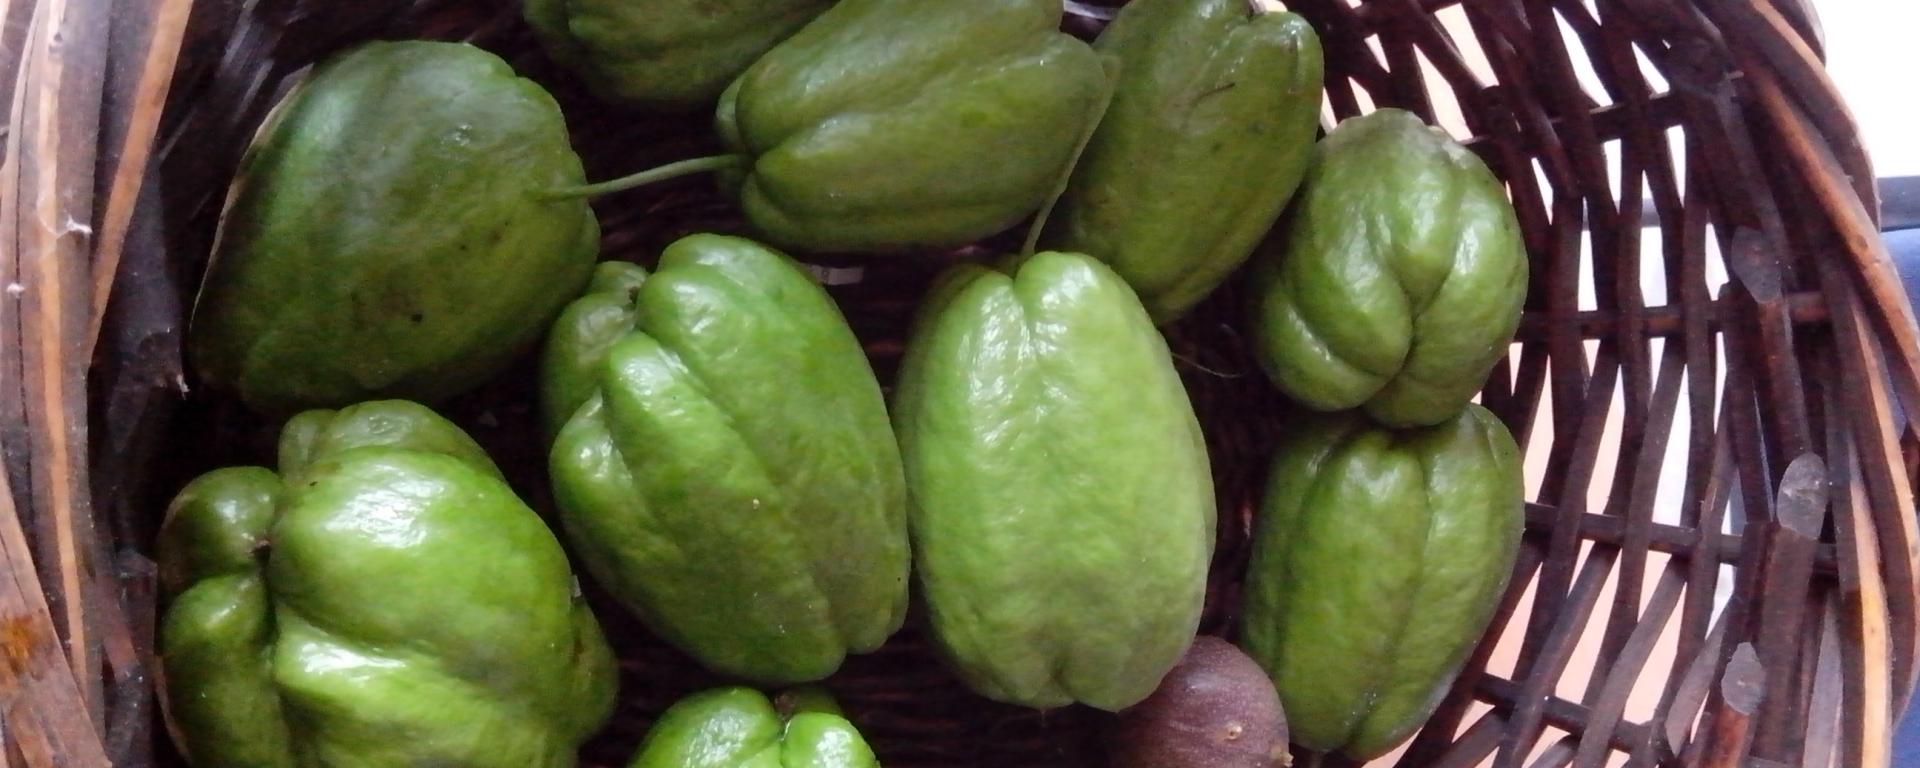 Growing Chokos or Chayotes – The Grantham Gardener